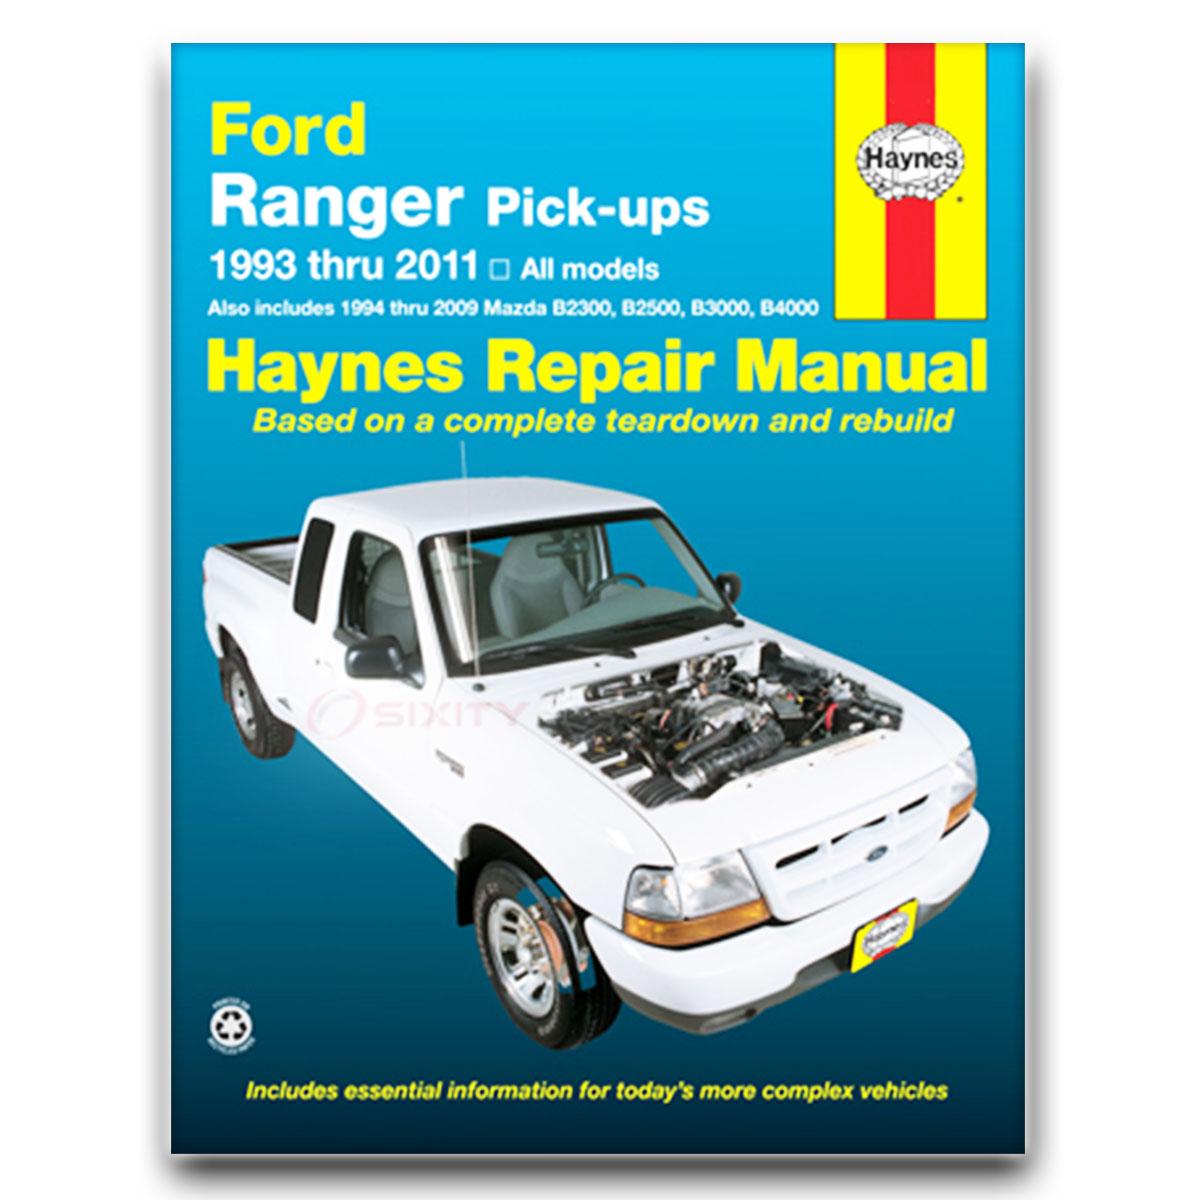 Ford Service Manuals: Haynes Ford Ranger Mazda Pick-ups 93-10 Repair Manual